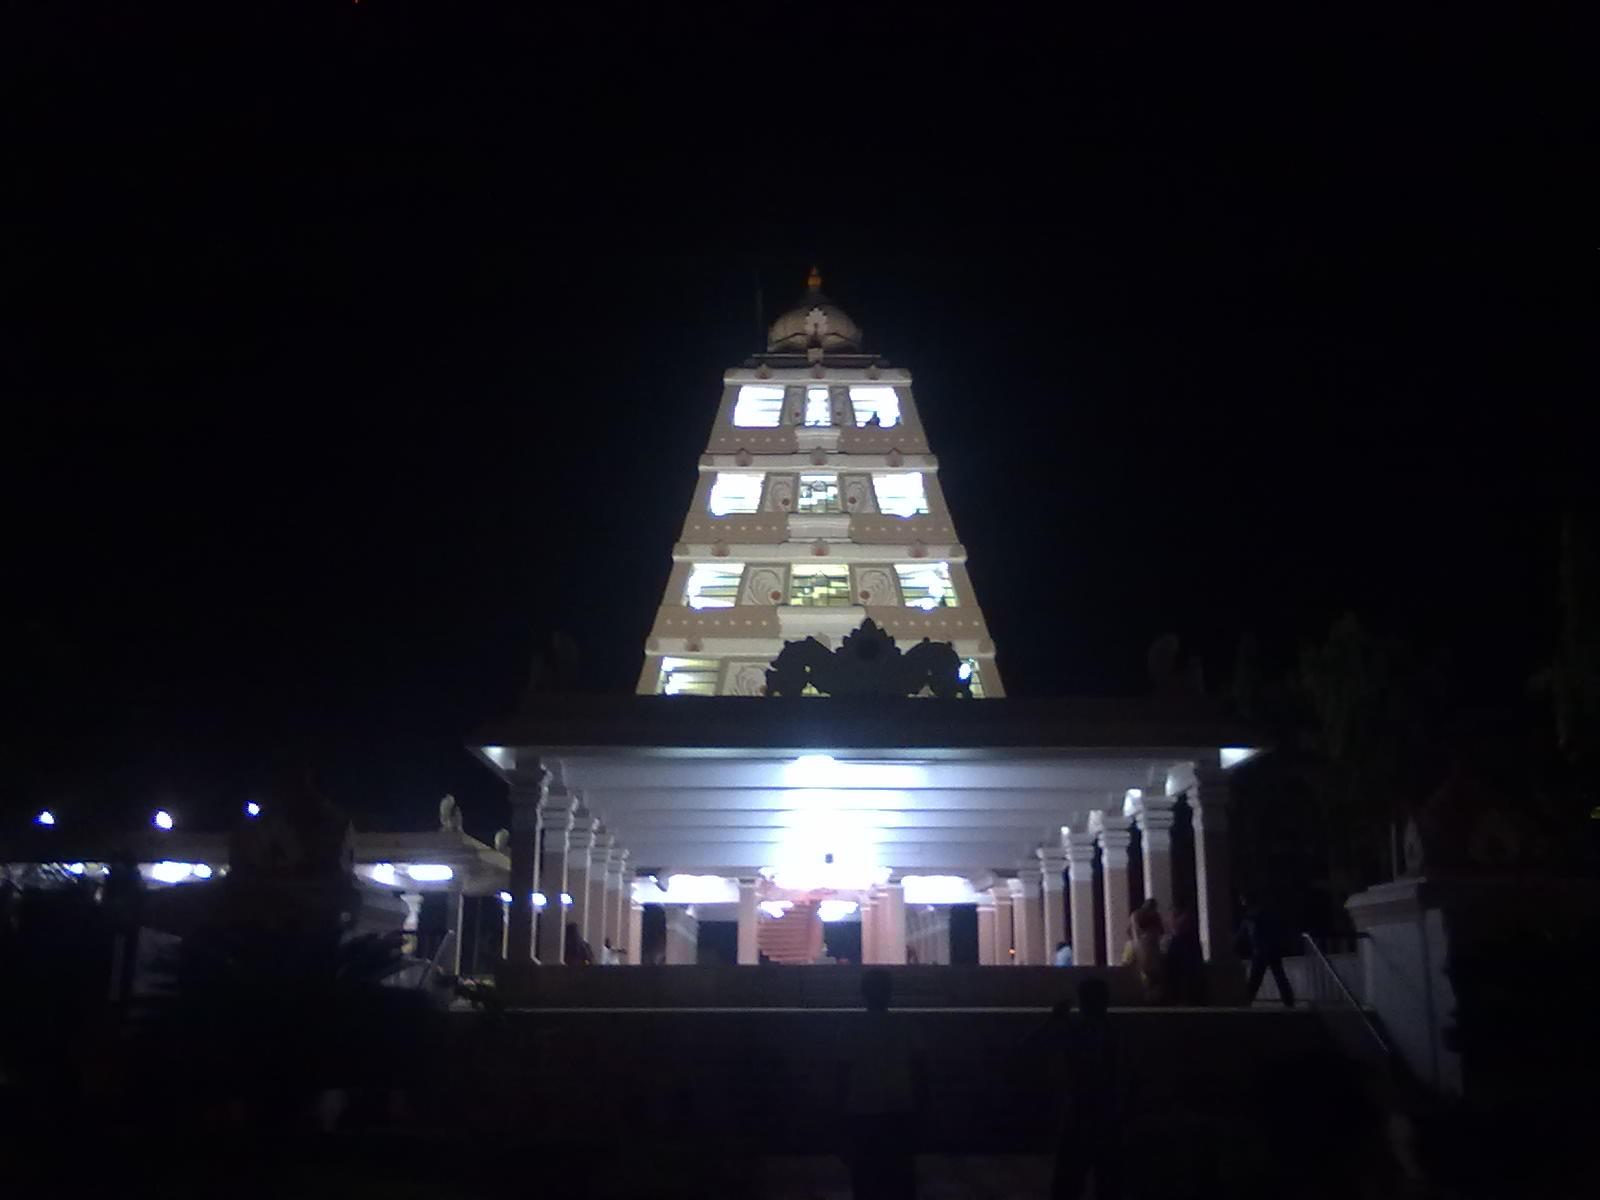 Rajarajan Manimandapam at dusk